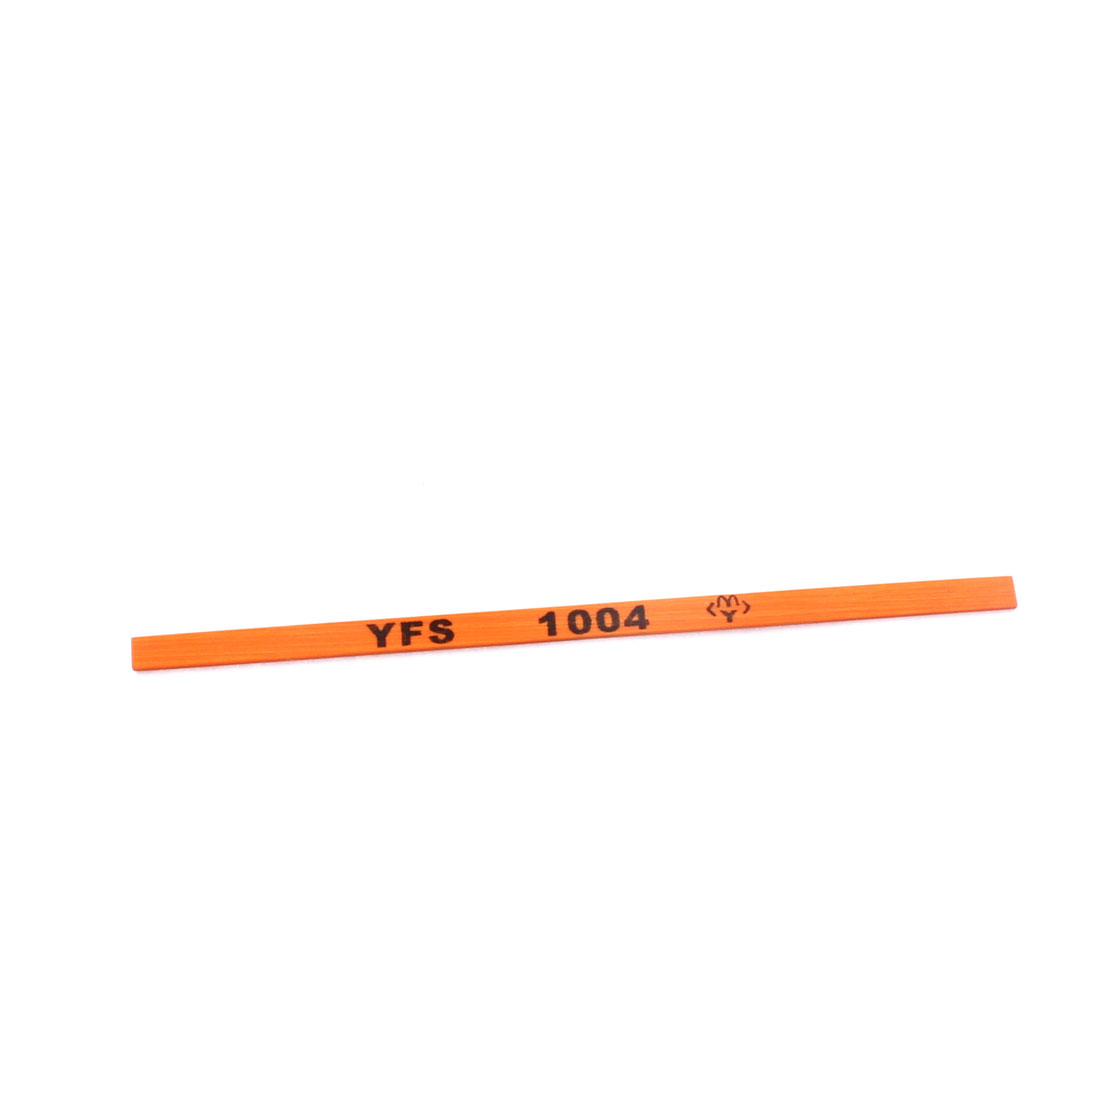 105mm x 4.5mm x 1mm 220# Boride Abrasives Grinding Oil Oily Stone Dark Orange